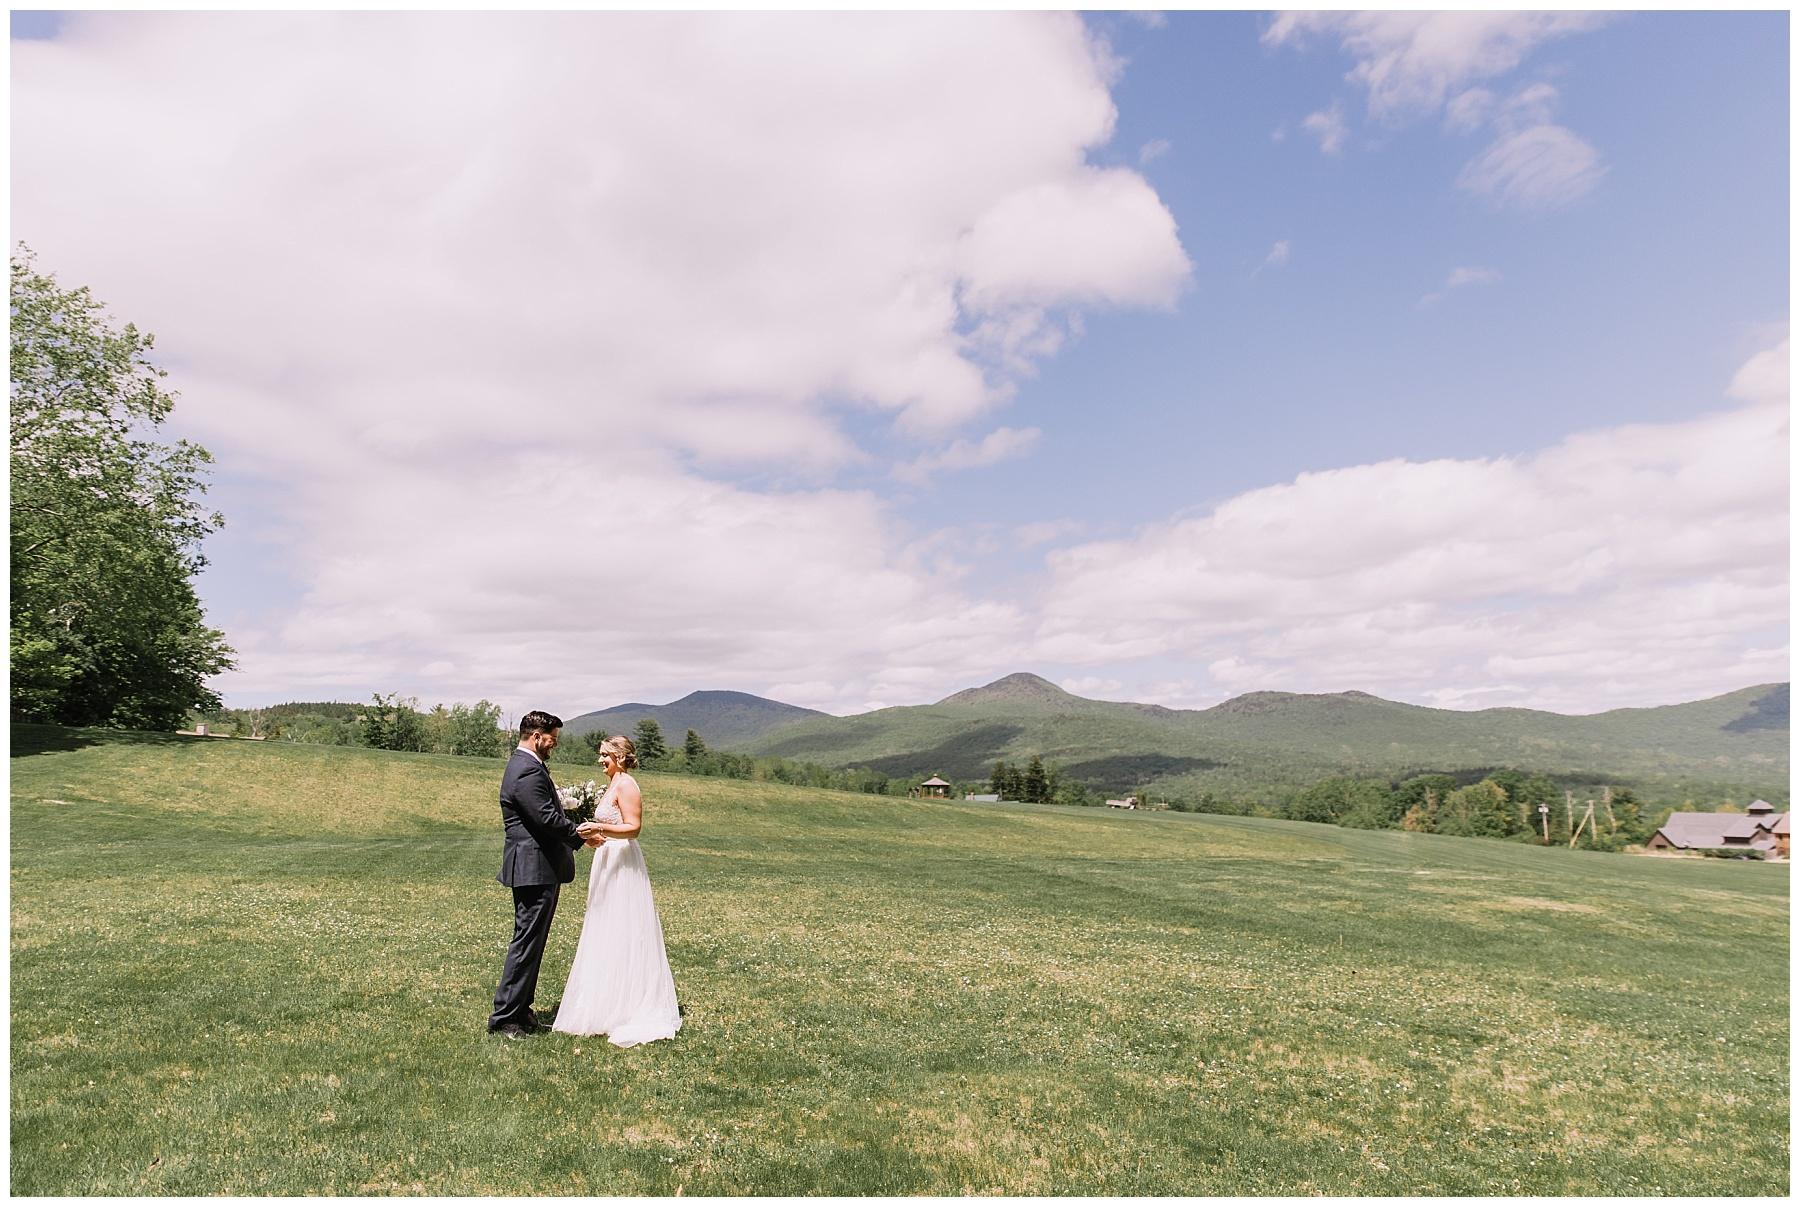 The Mountain Top Inn, Chittenden Vermont Wedding